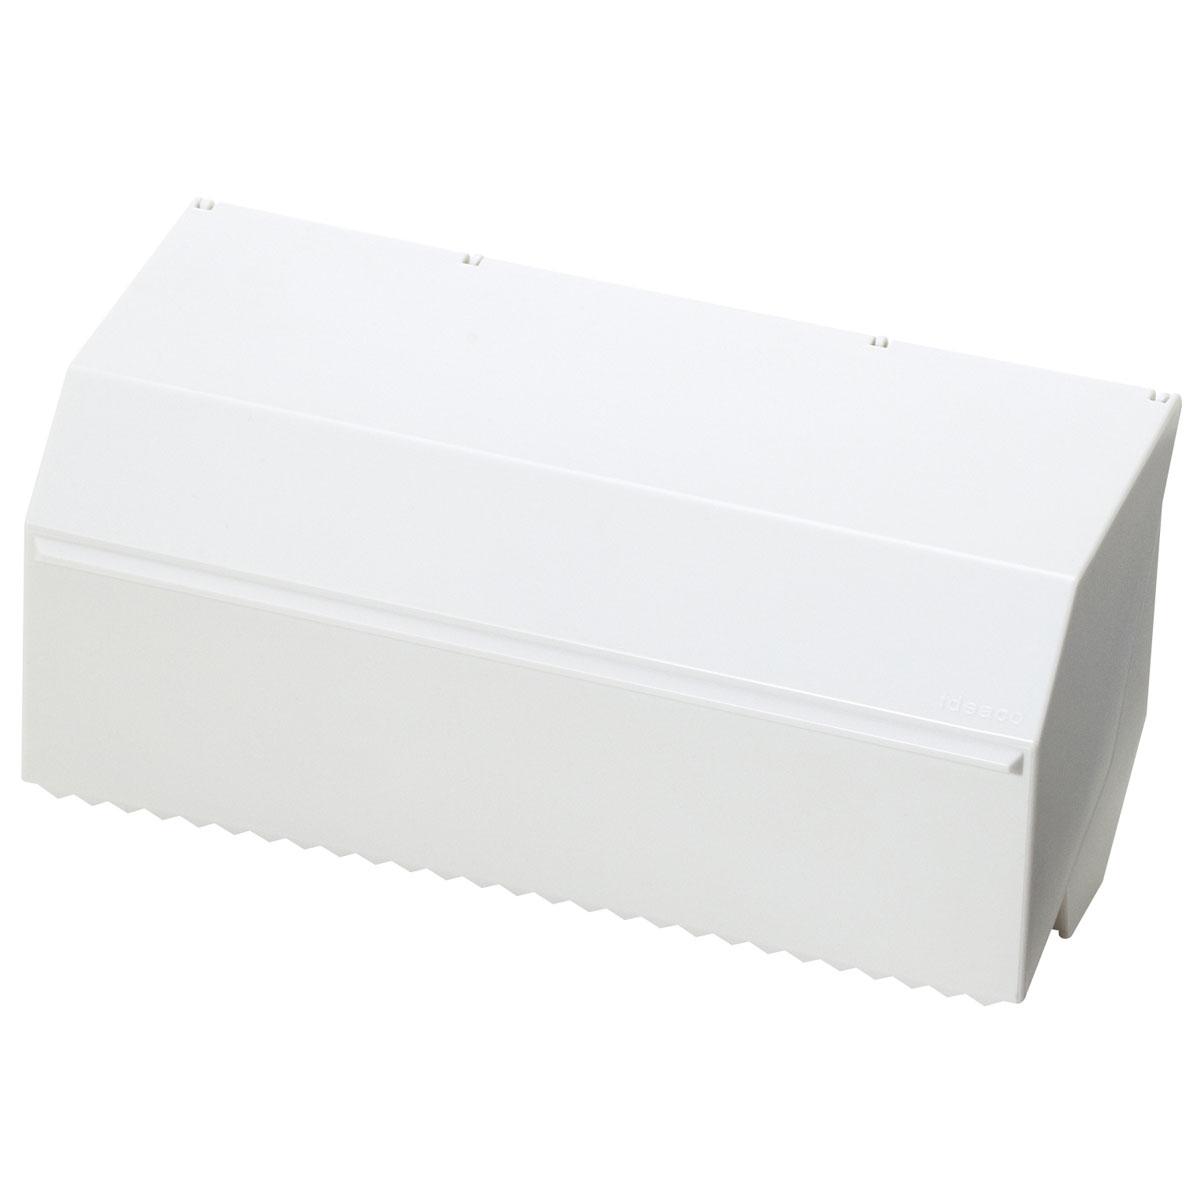 kitchen towel dispenser キッチンタオルディスペンサー ホワイト / ideacoの写真